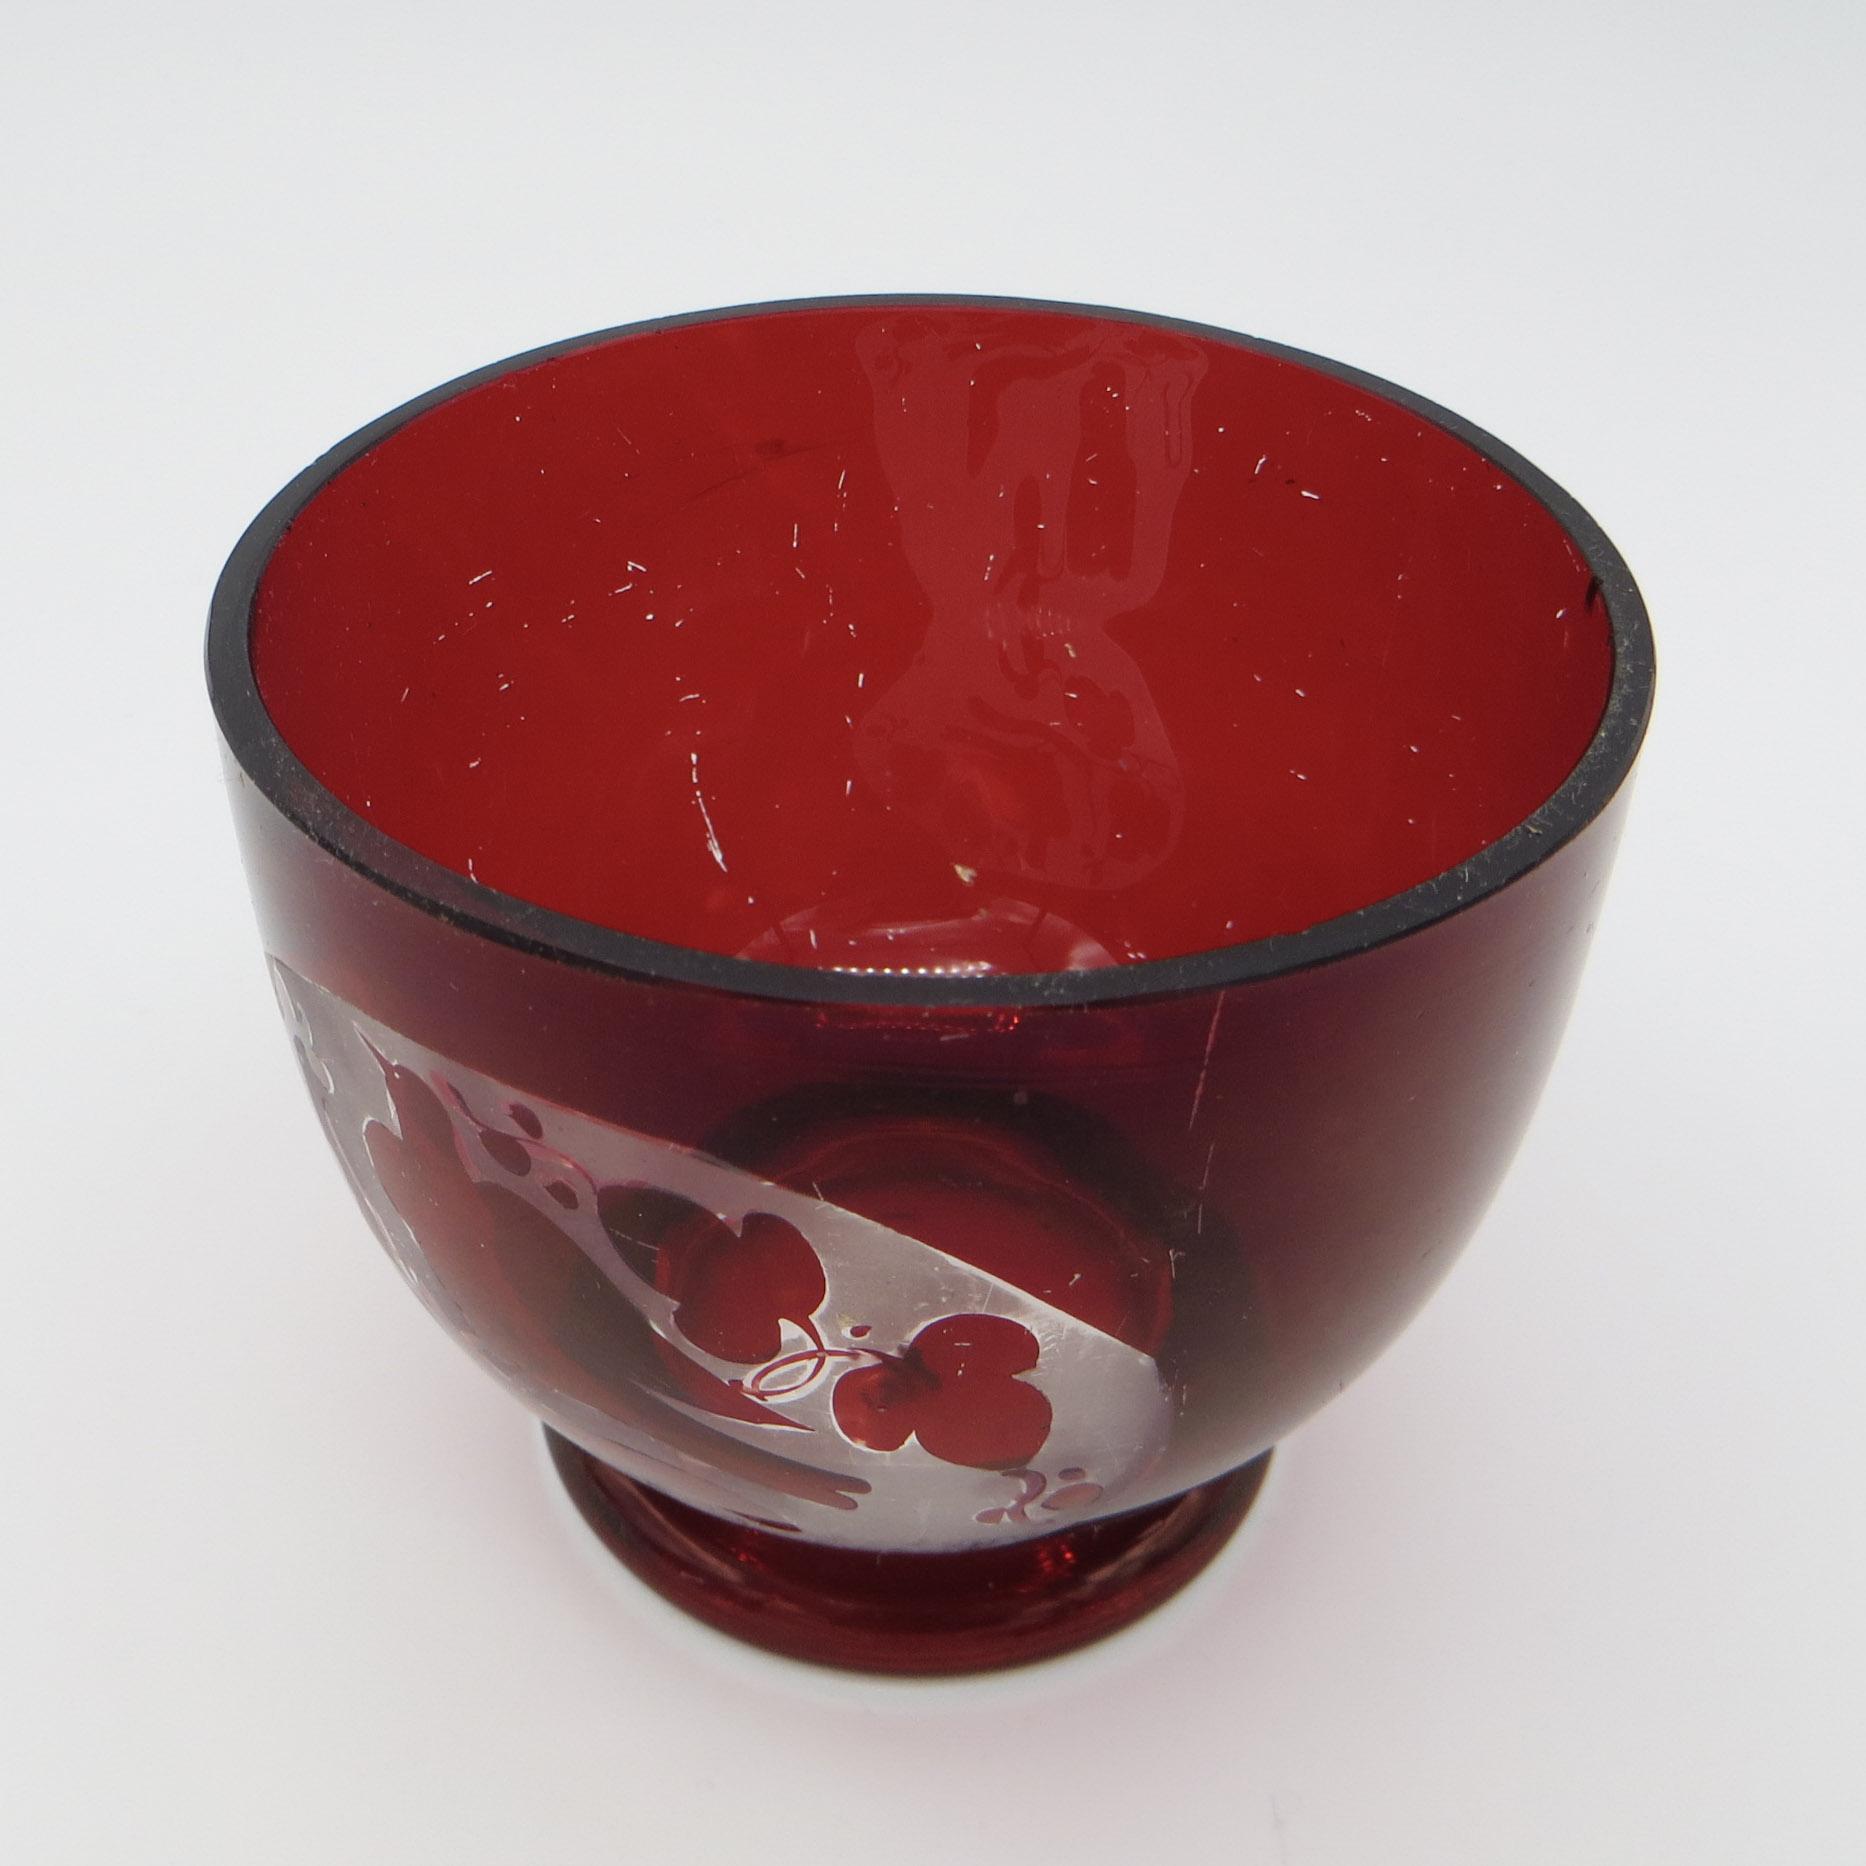 Ruby Lovebirds Candy Dish